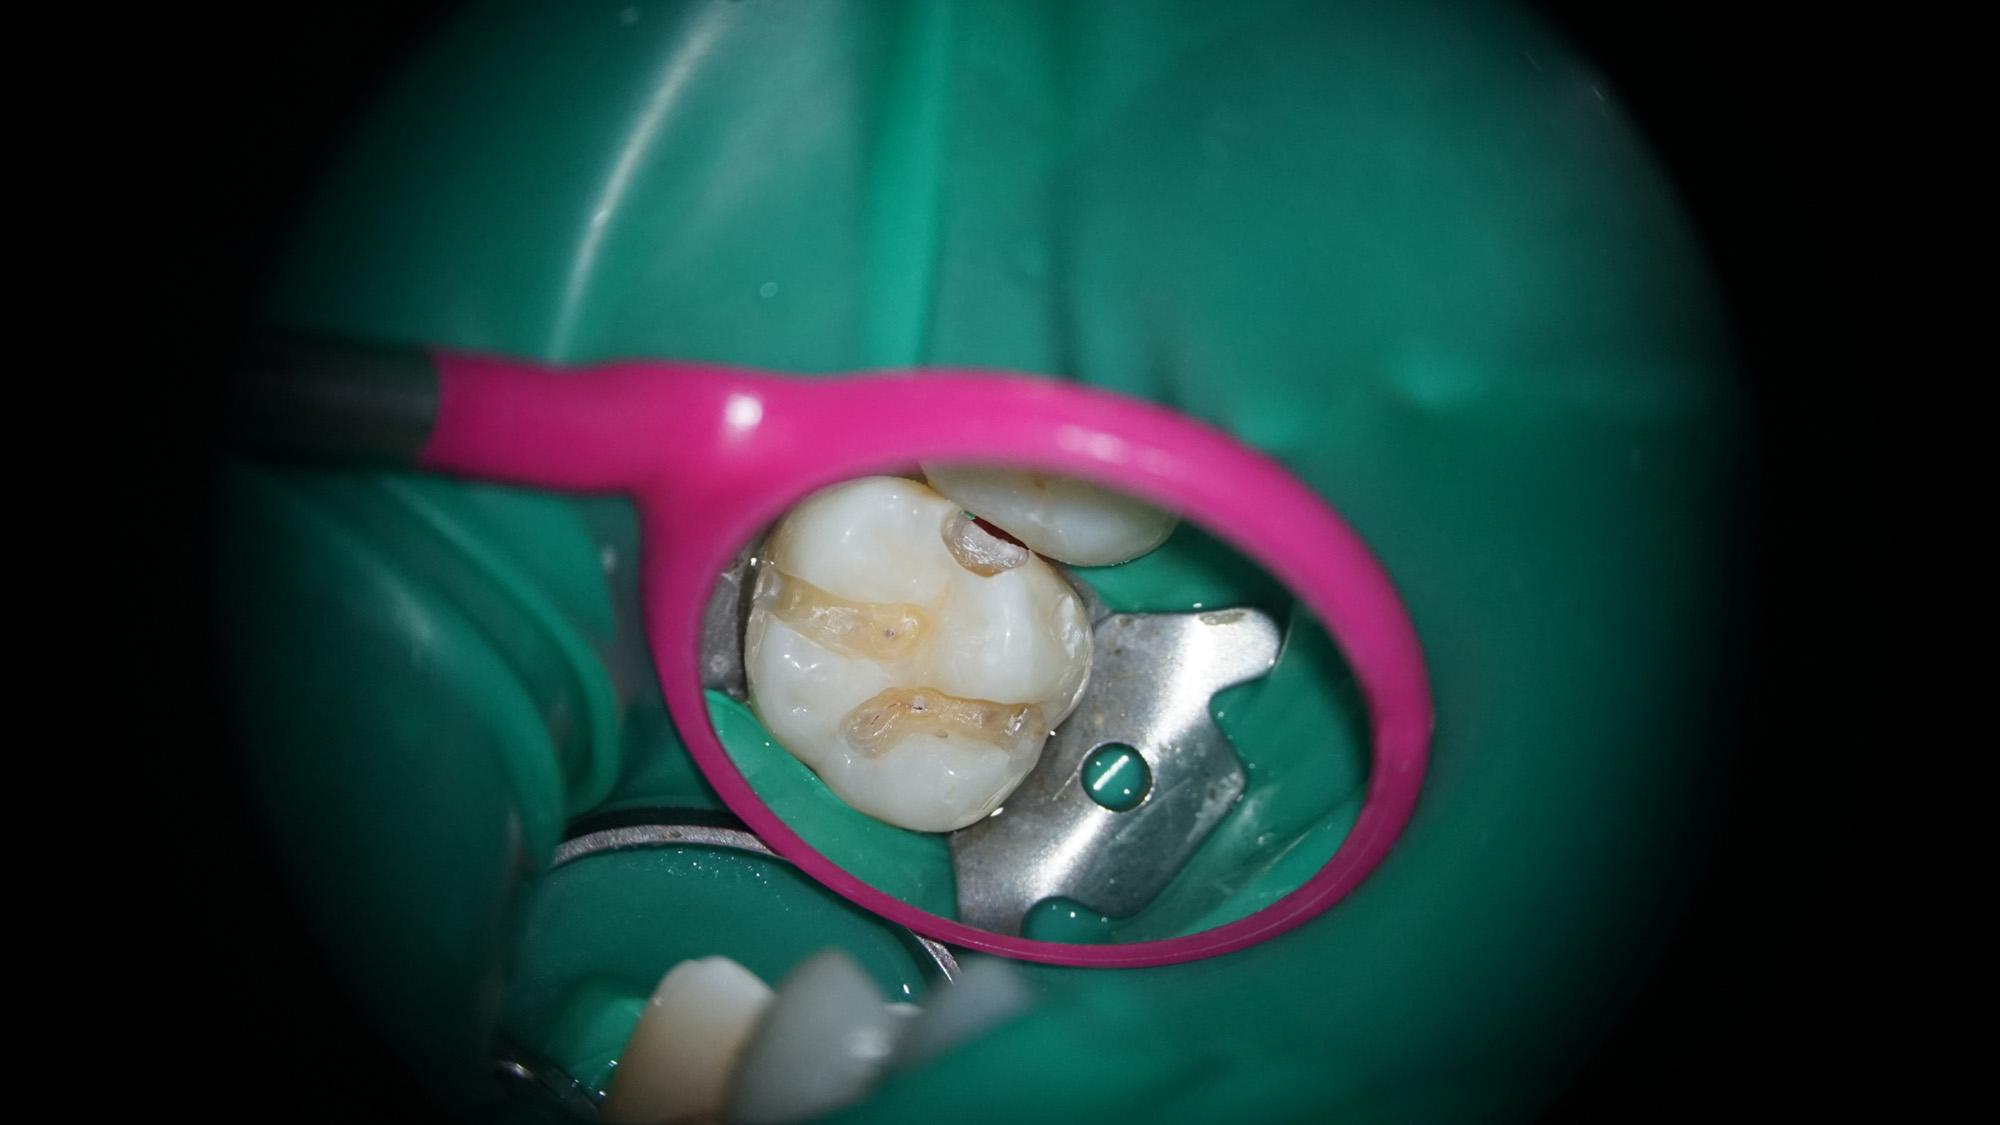 Dental work through microscope